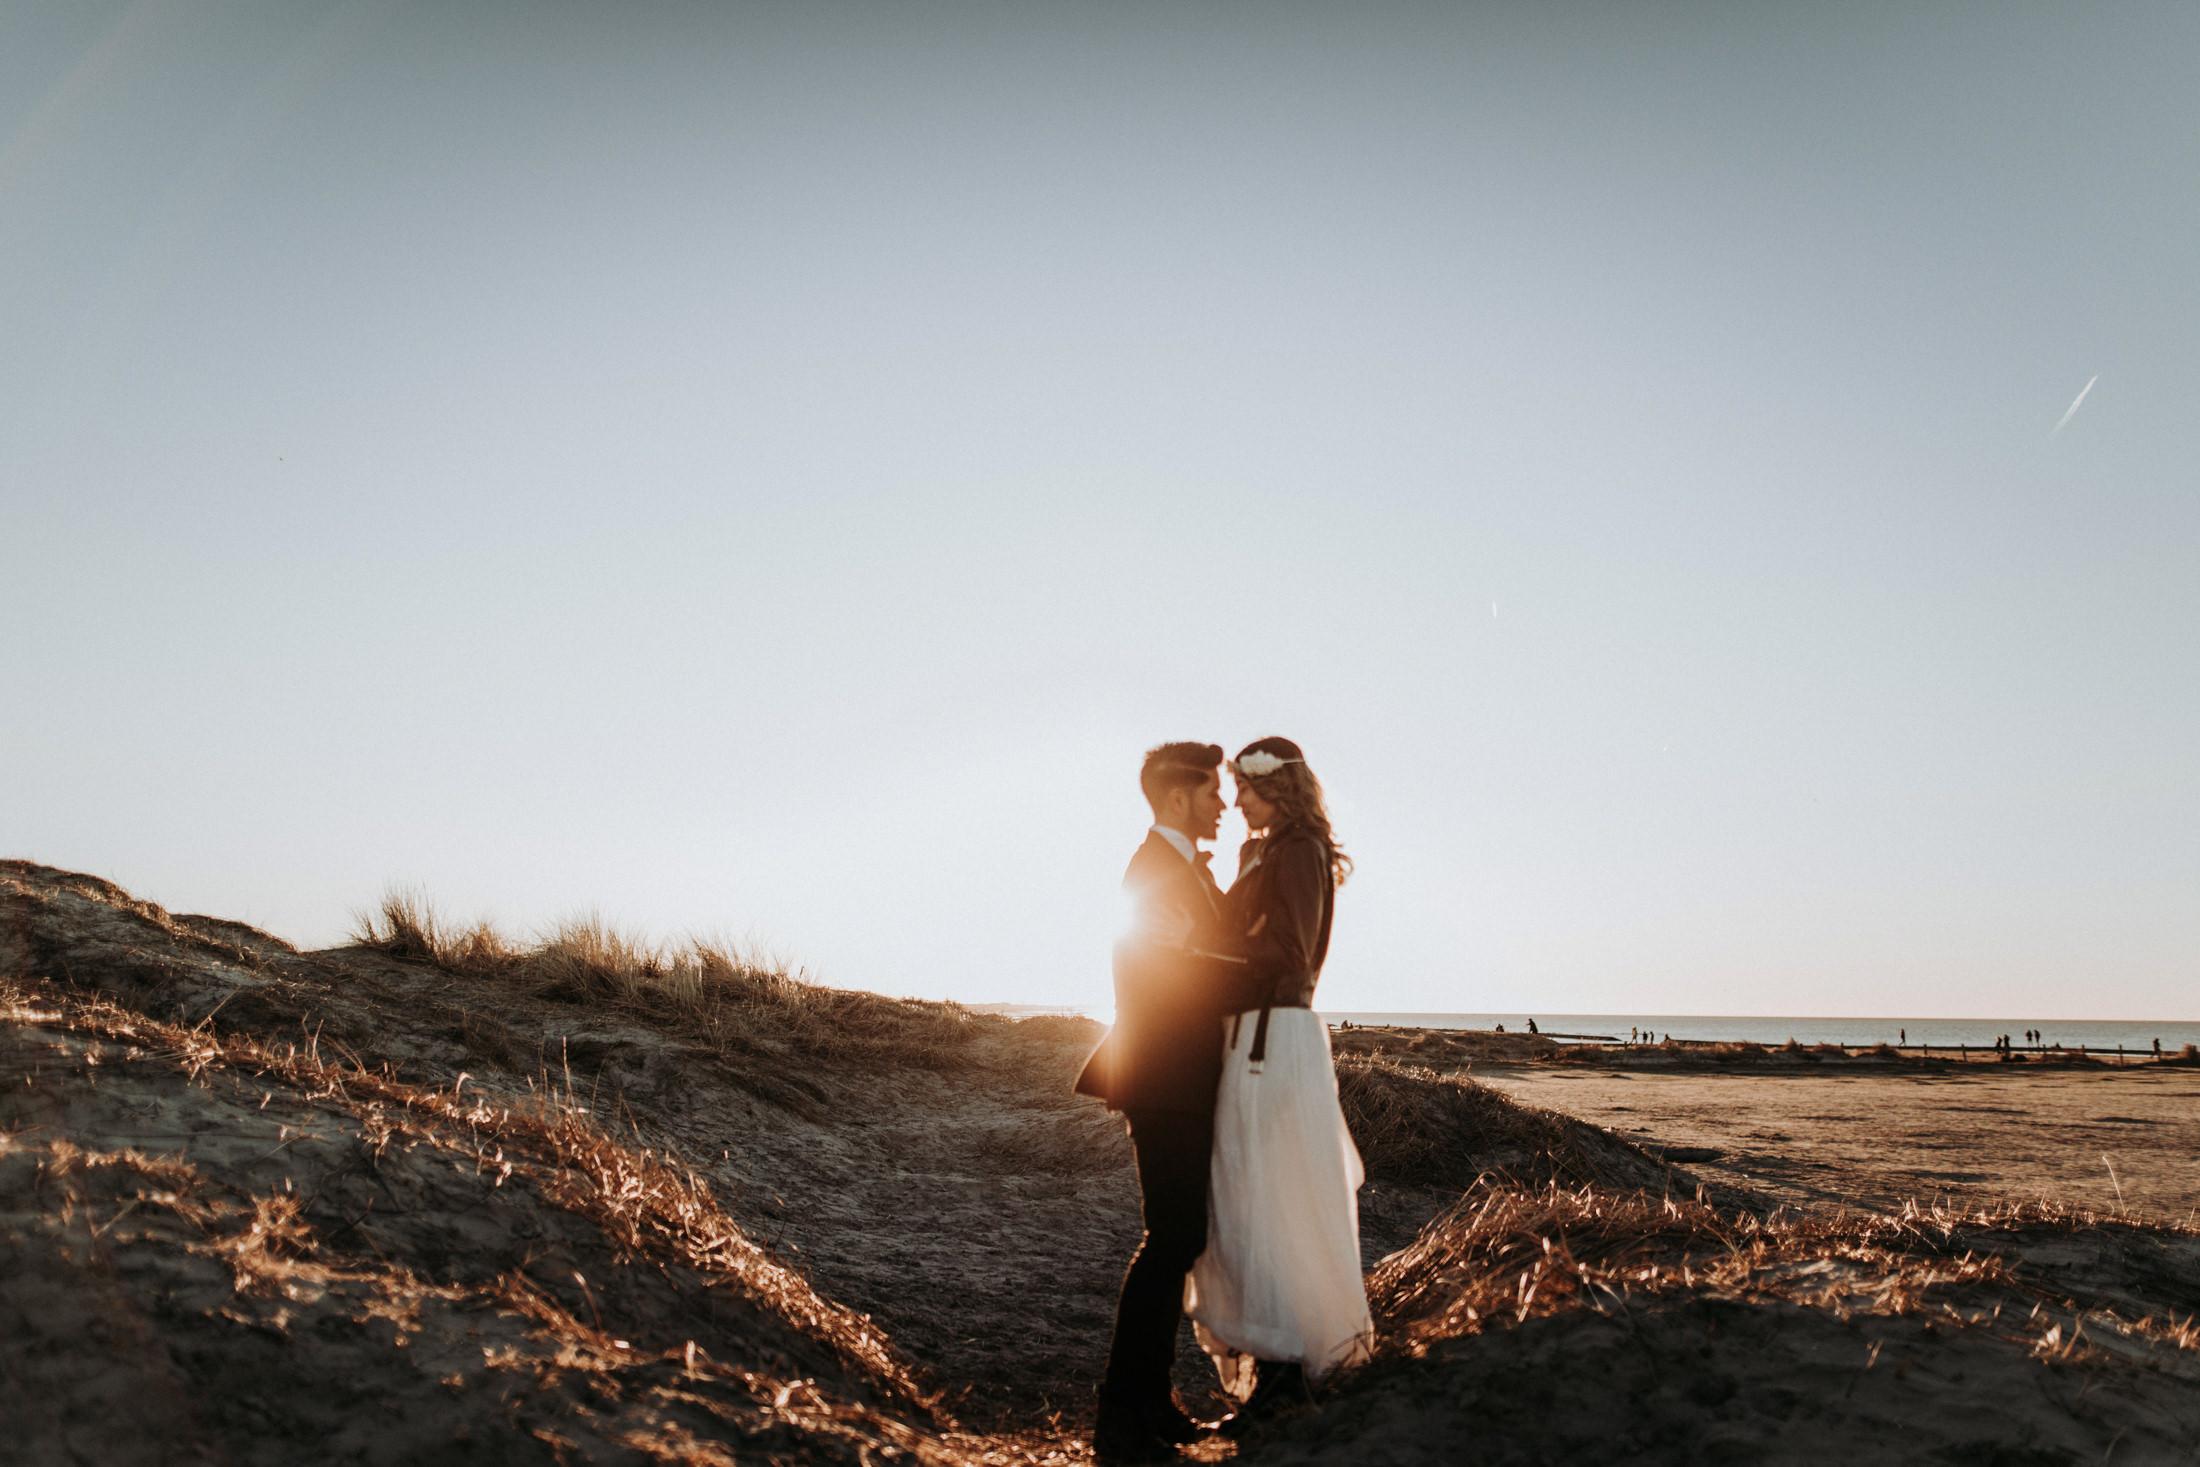 Wedding_Photographer_Mallorca_Daniela-Marquardt_Photography_CanaryIslands_Lanzarote_Iceland_Tuskany_Santorini_Portugal_Schweiz_Austria_Bayern_Elopement_Hochzeitsfotograf_Norddeichich_19